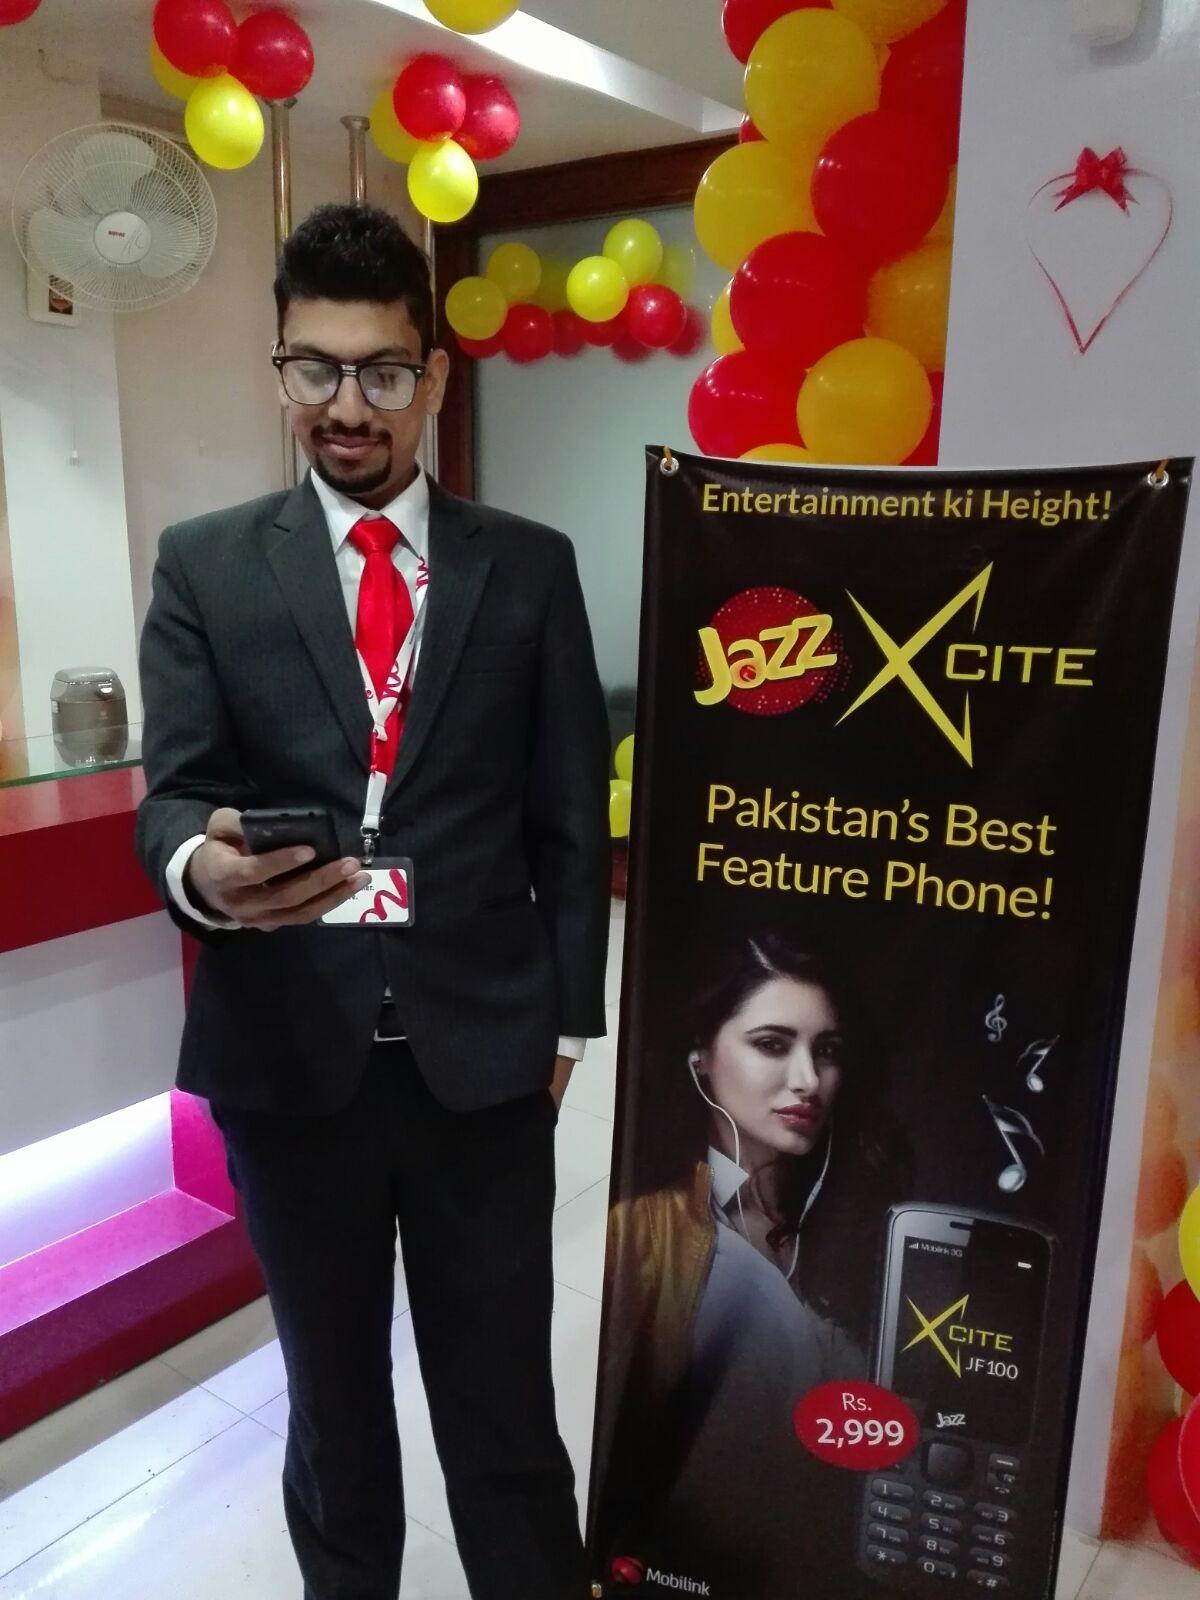 Muhammad Waqas Music, Photo Editing, Voice Talent, Audio Services, Telemarketing